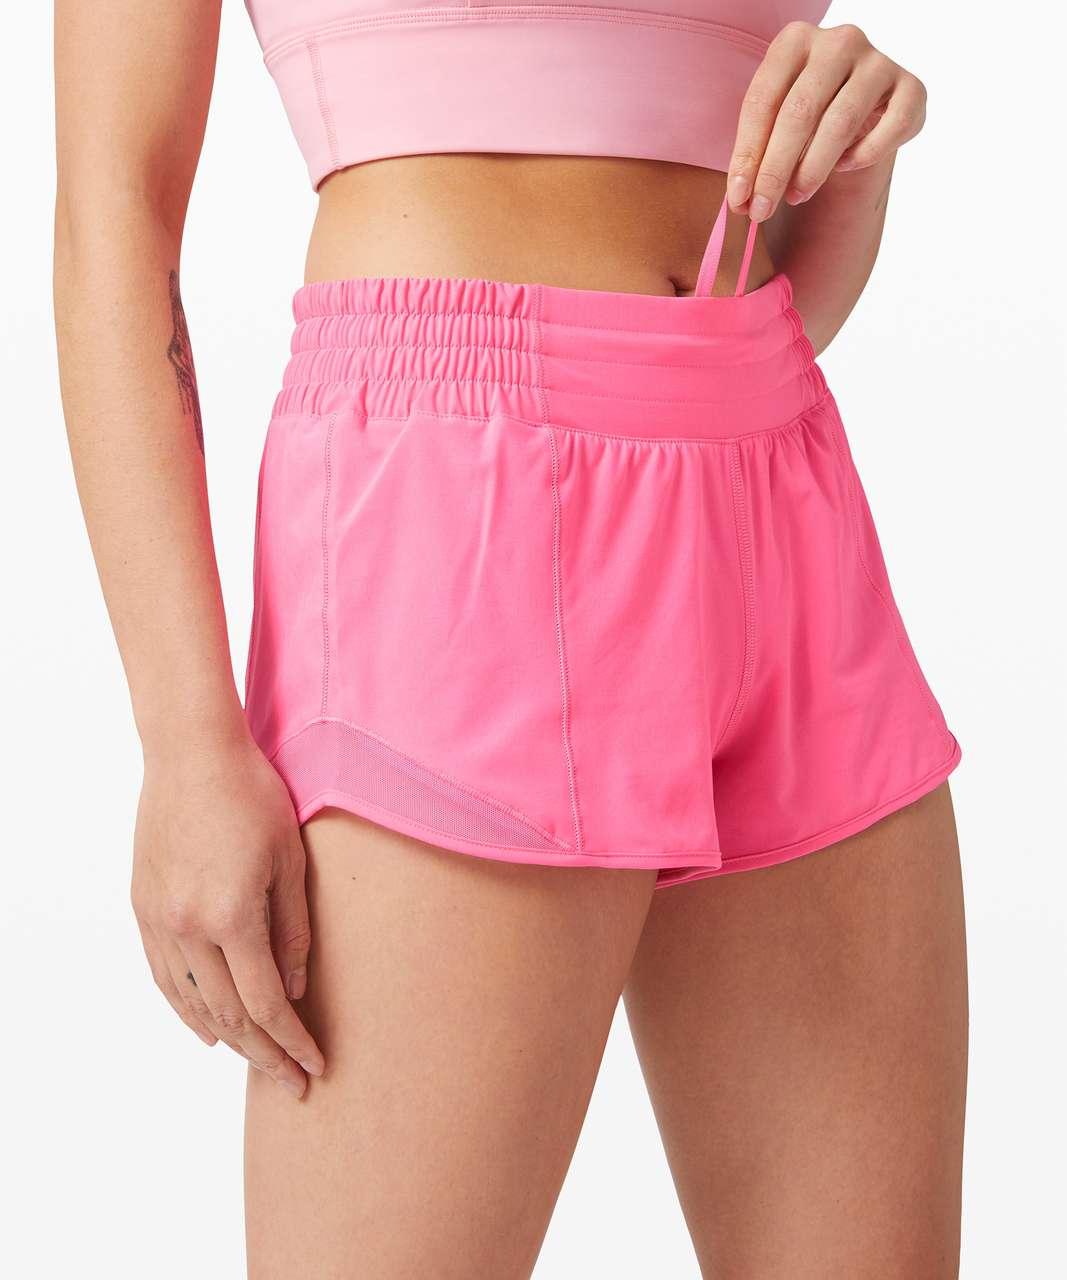 "Lululemon Hotty Hot Short *High-Rise 2.5"" - Dark Prism Pink"